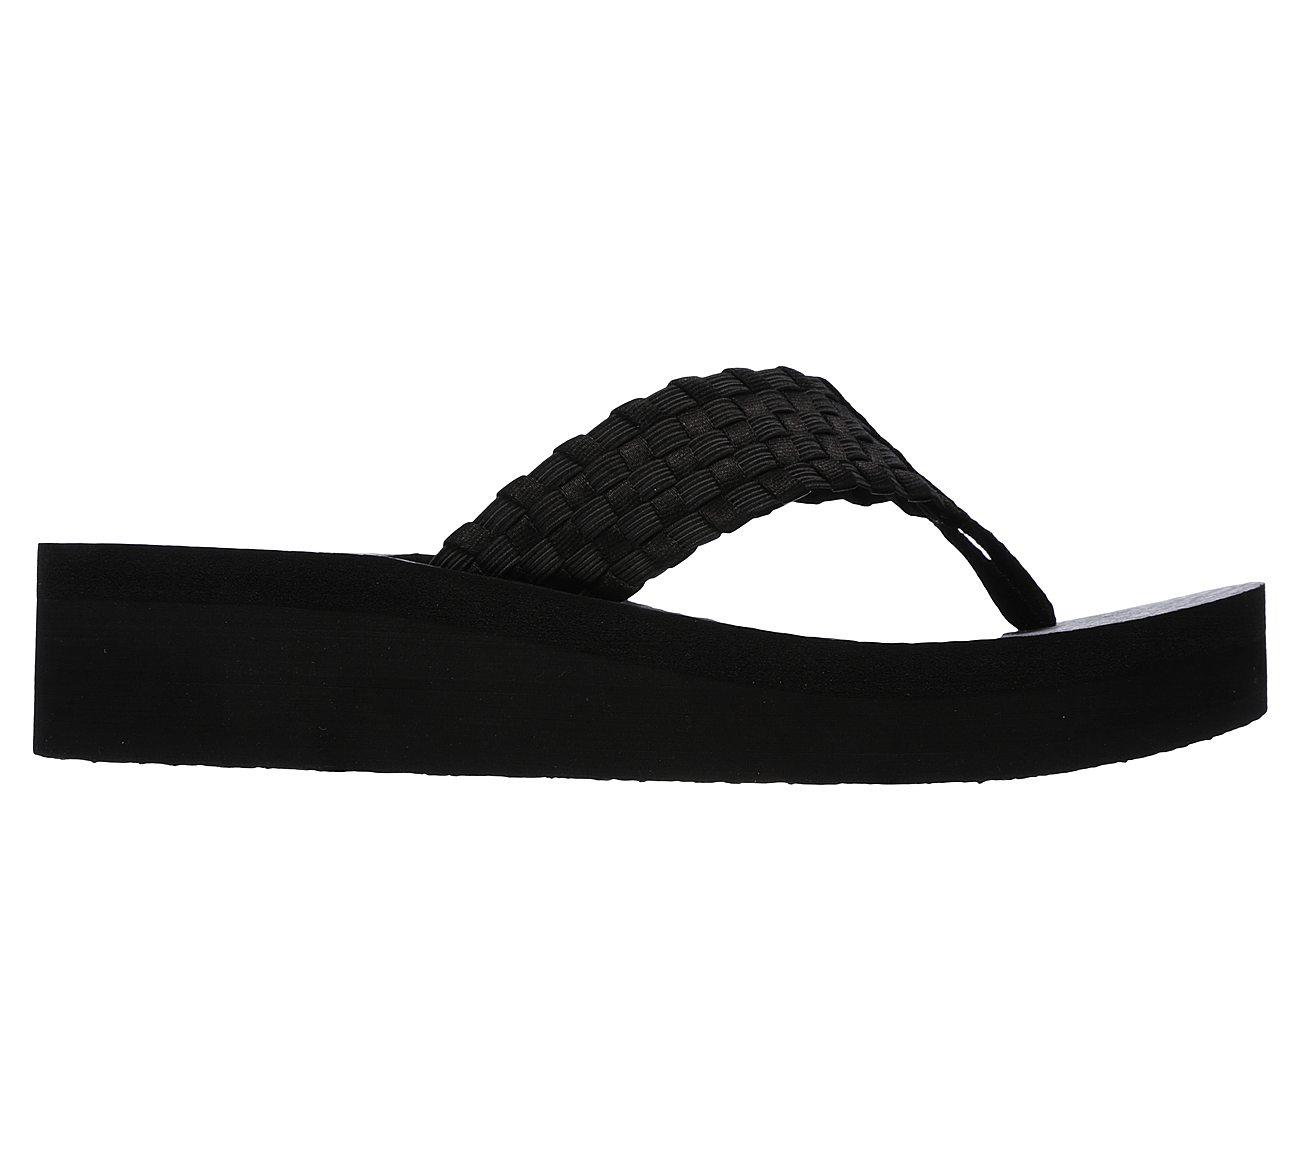 Buy Skechers Vinyasa Tricker Weave Cali Shoes Only 40 00